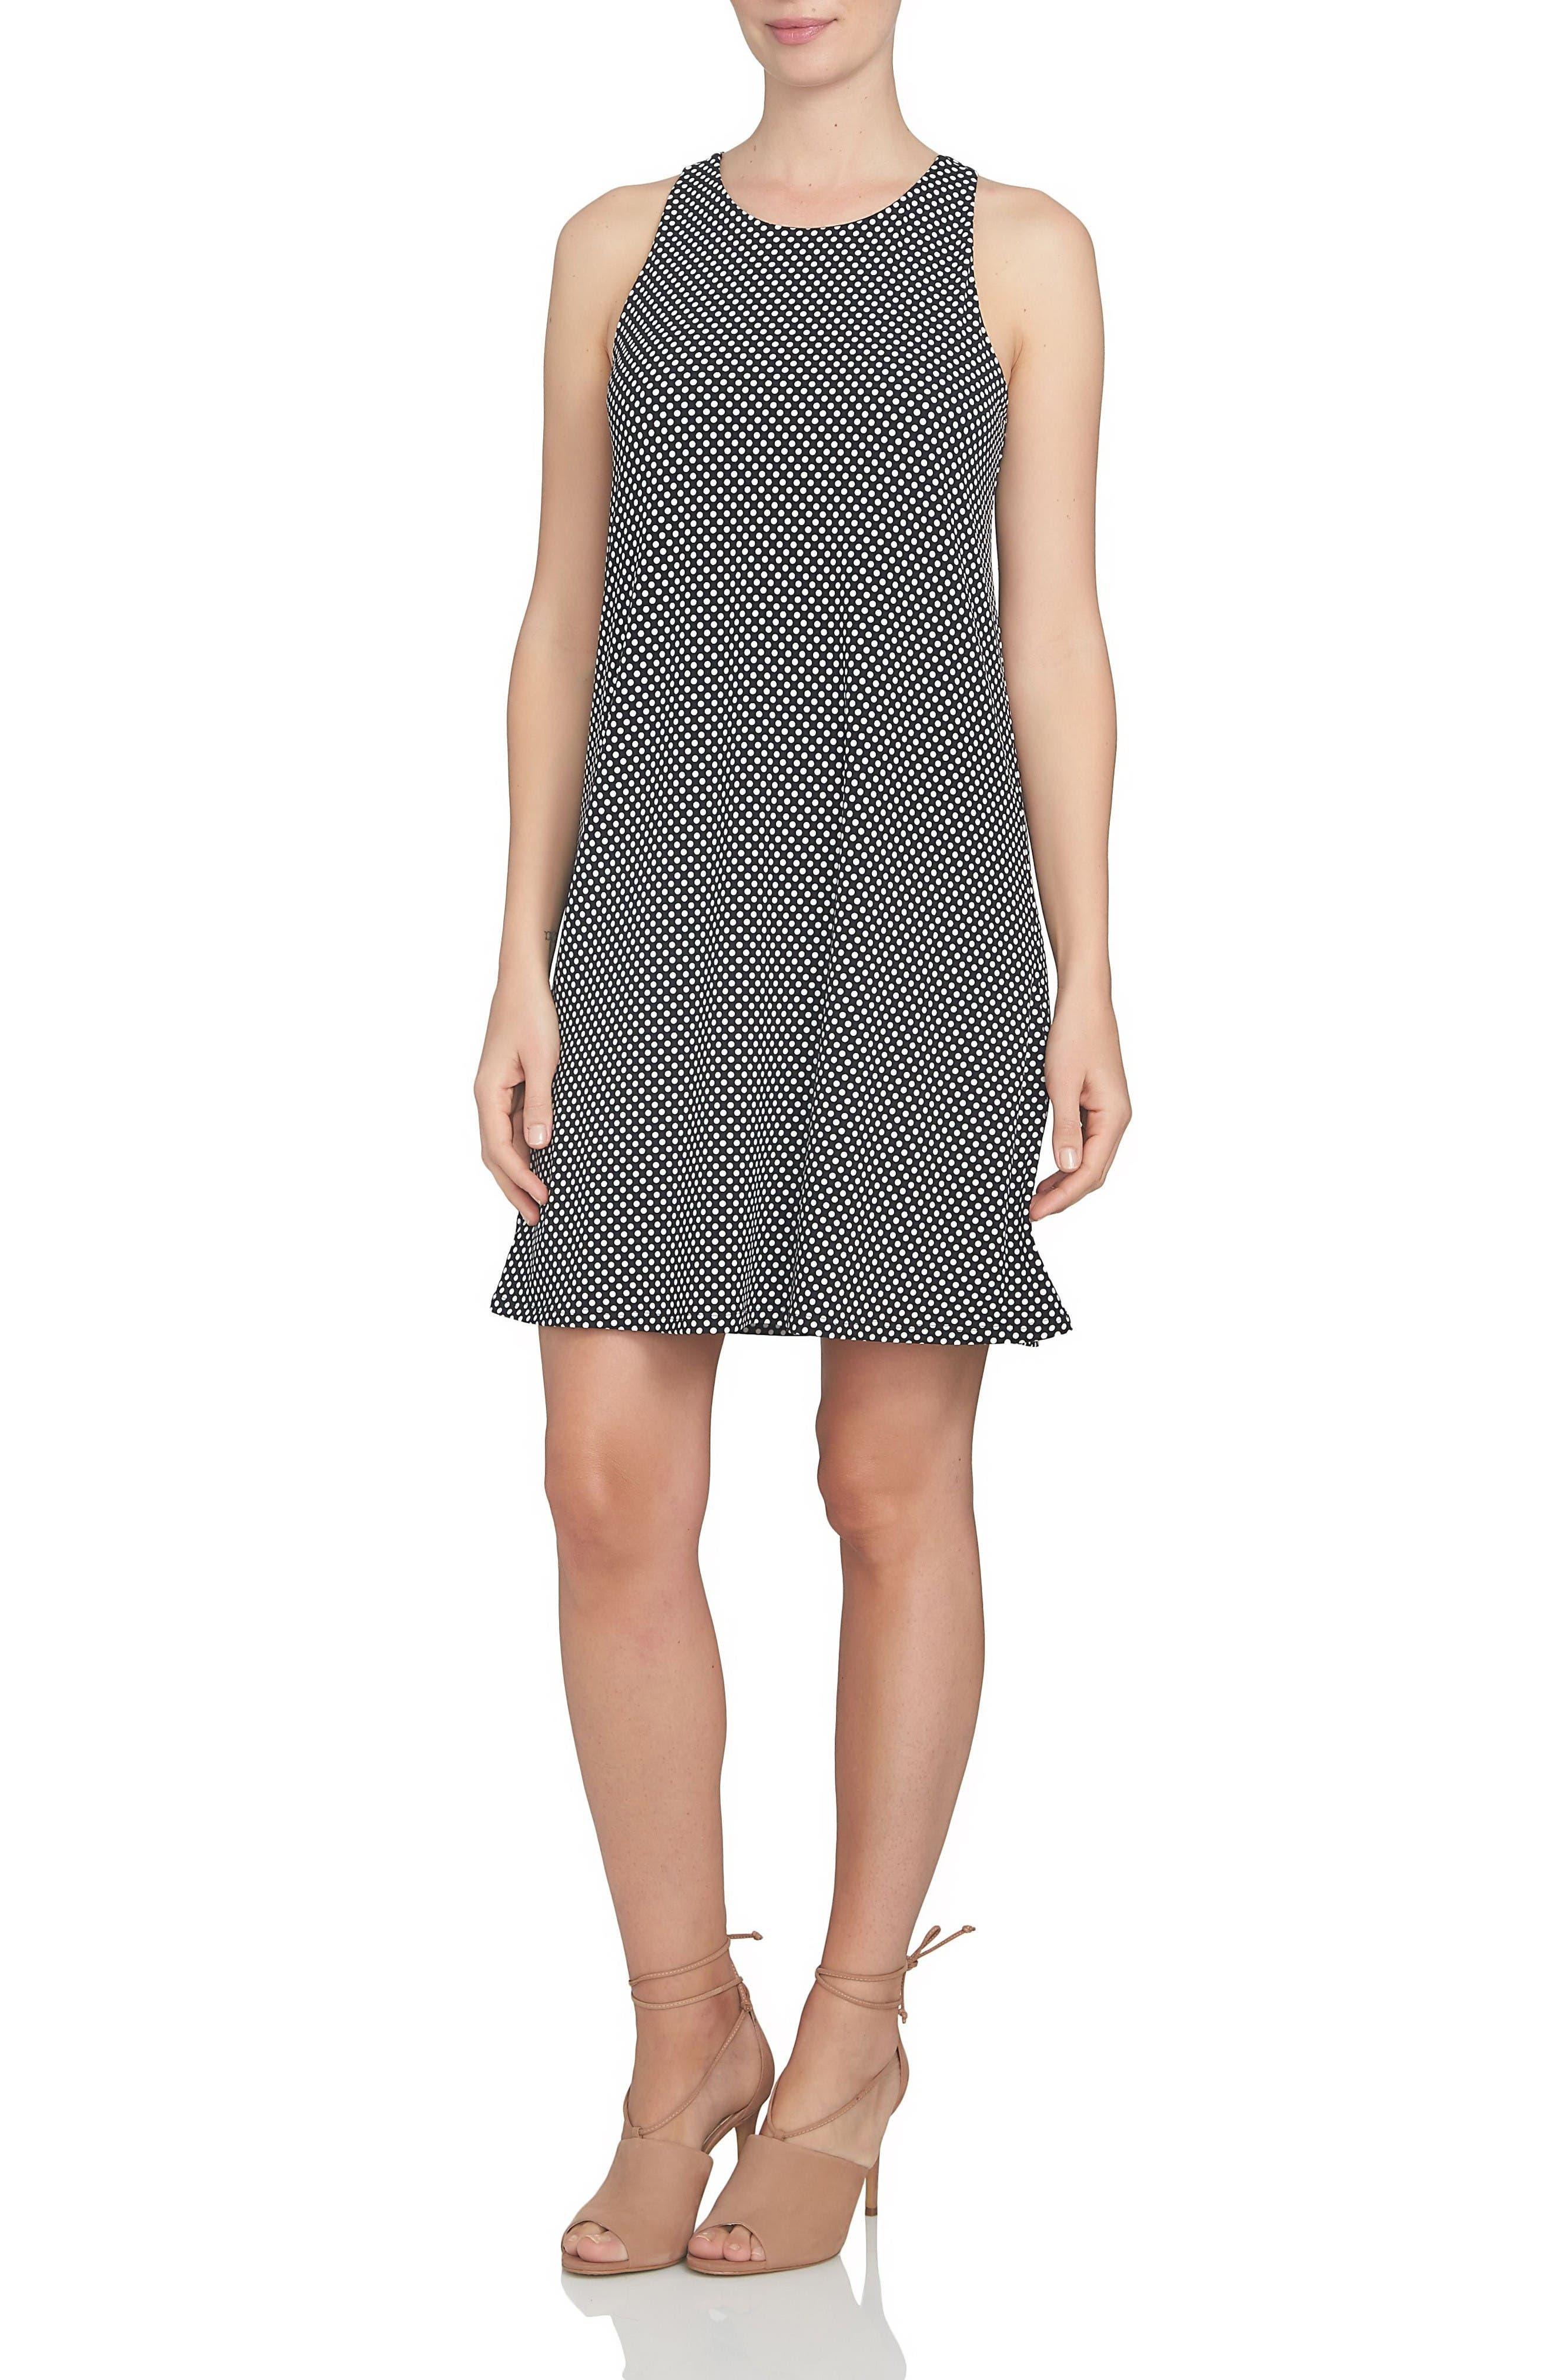 Main Image - CeCe Polka Dot Twist Back Knit Shift Dress